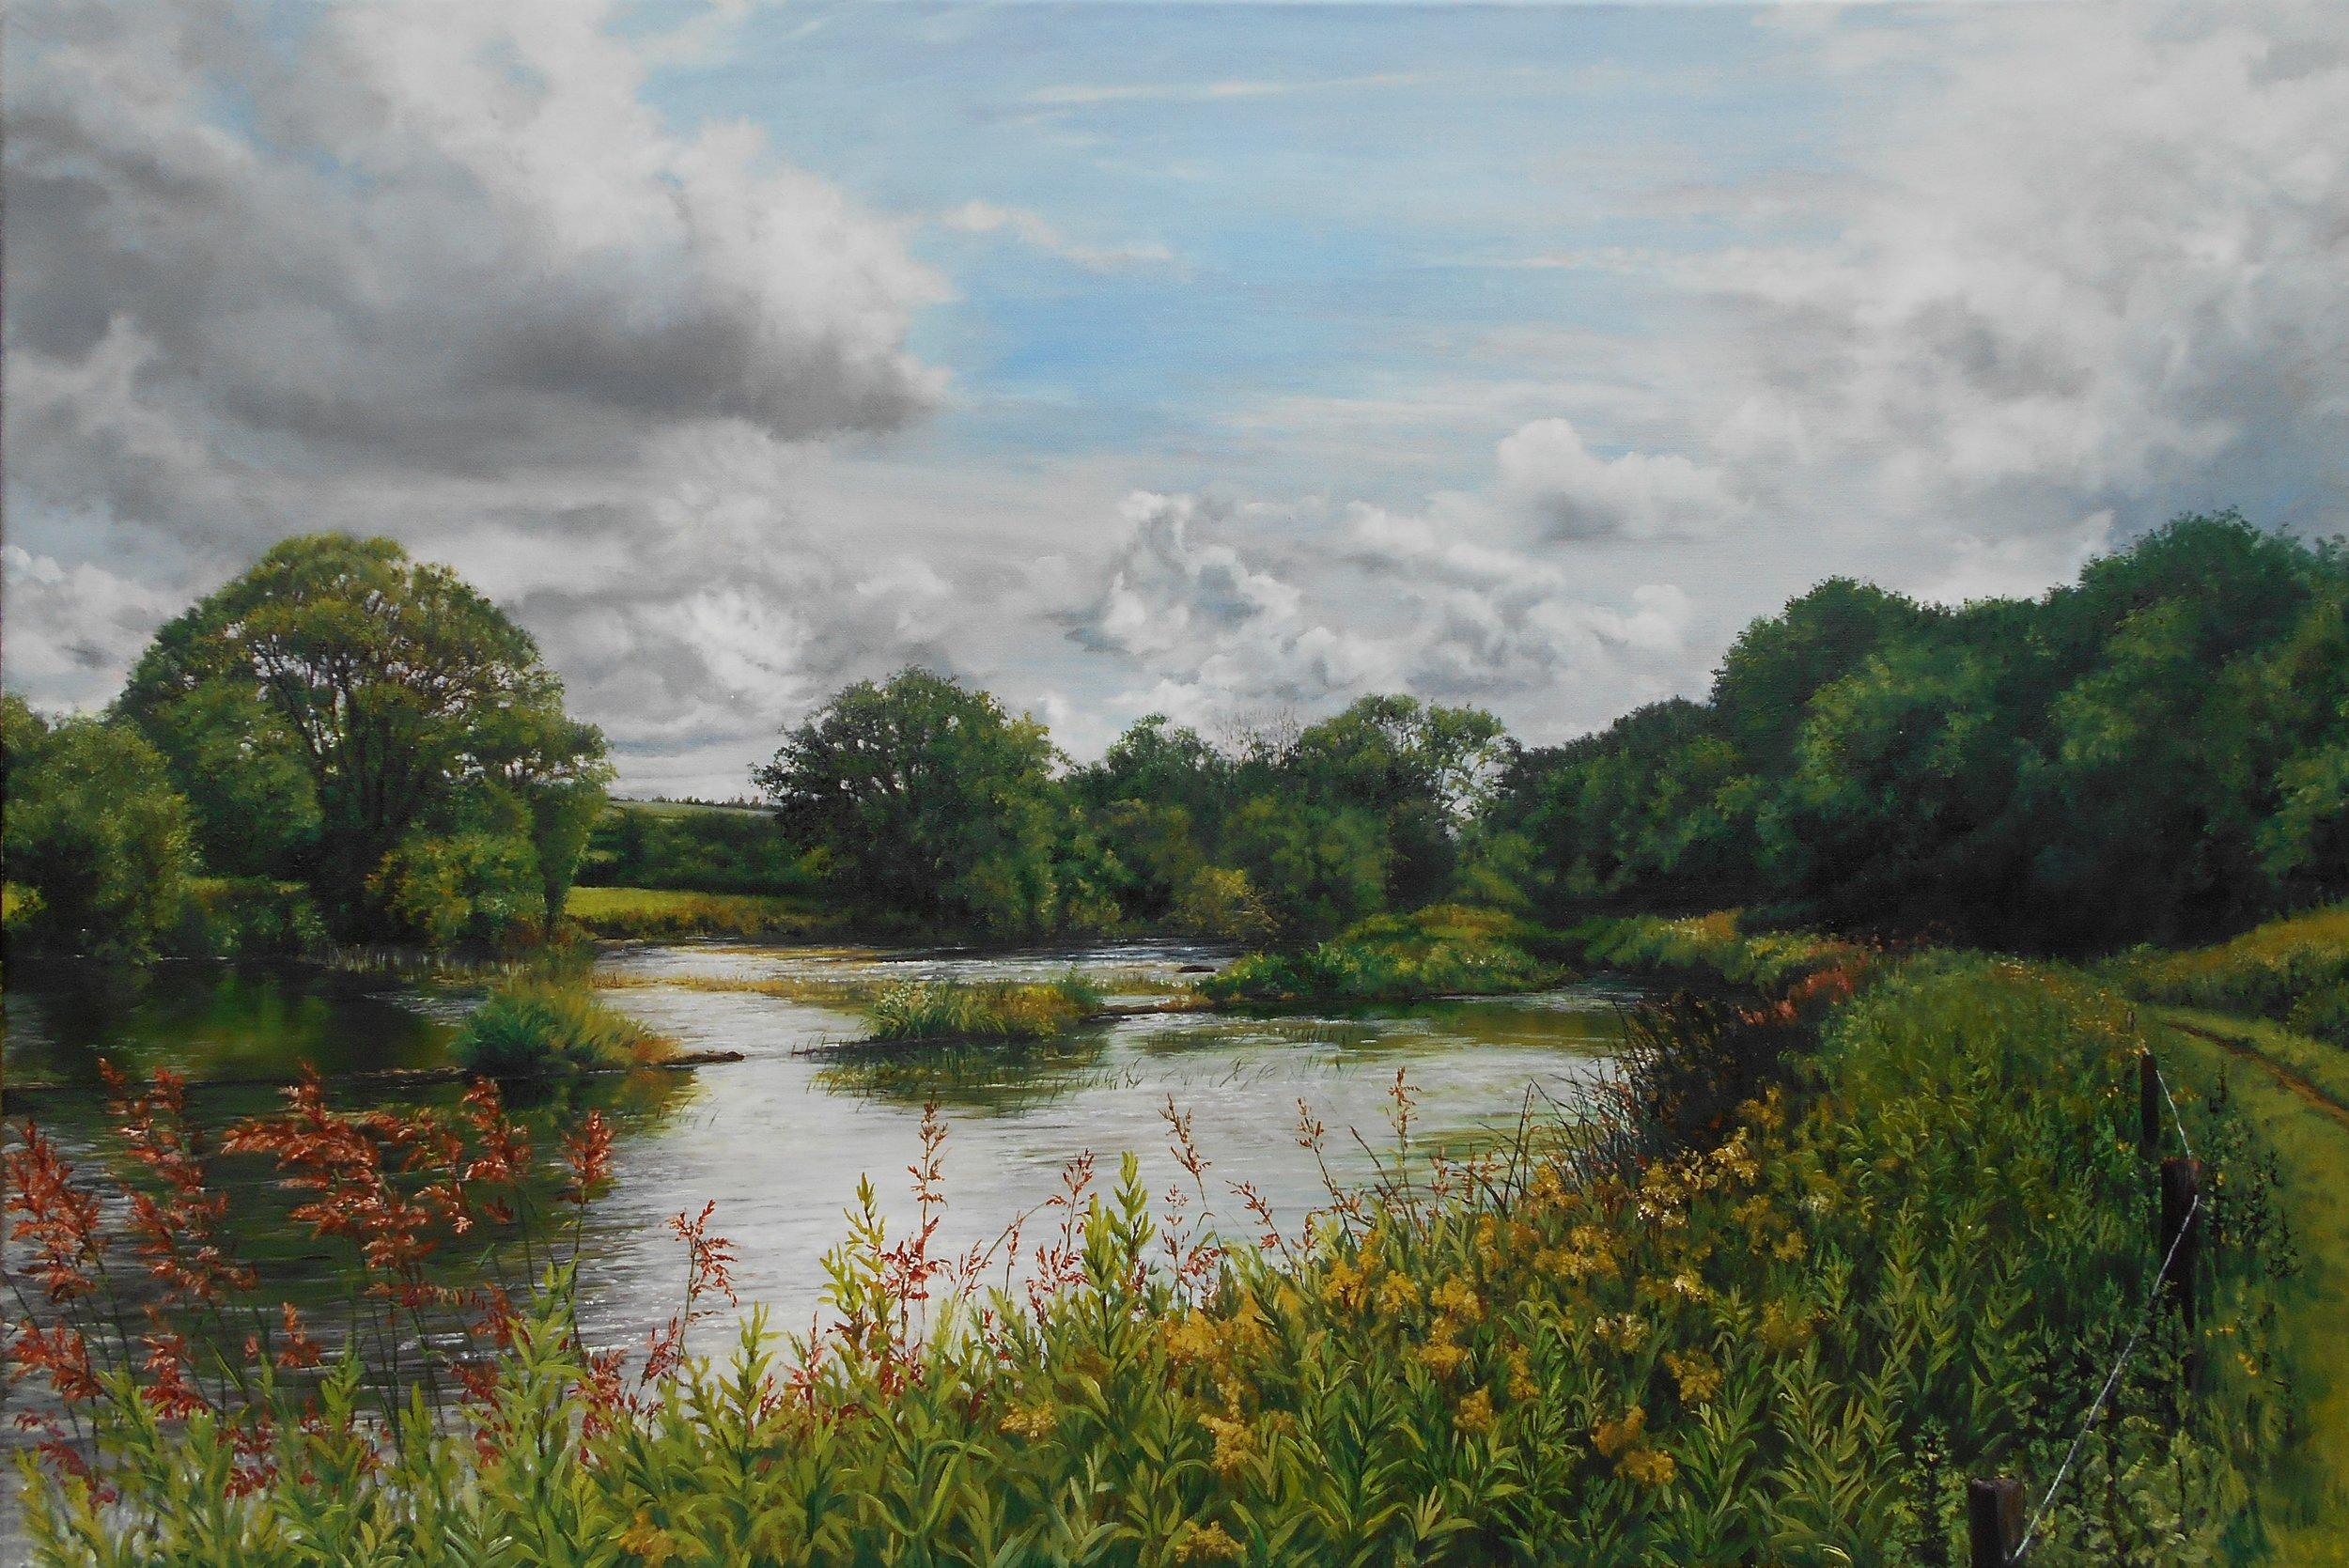 Sarah Corner, the weir on the river Suir, Oil on linen canvas, 50x76x2,  http://www.sarahcorner.com